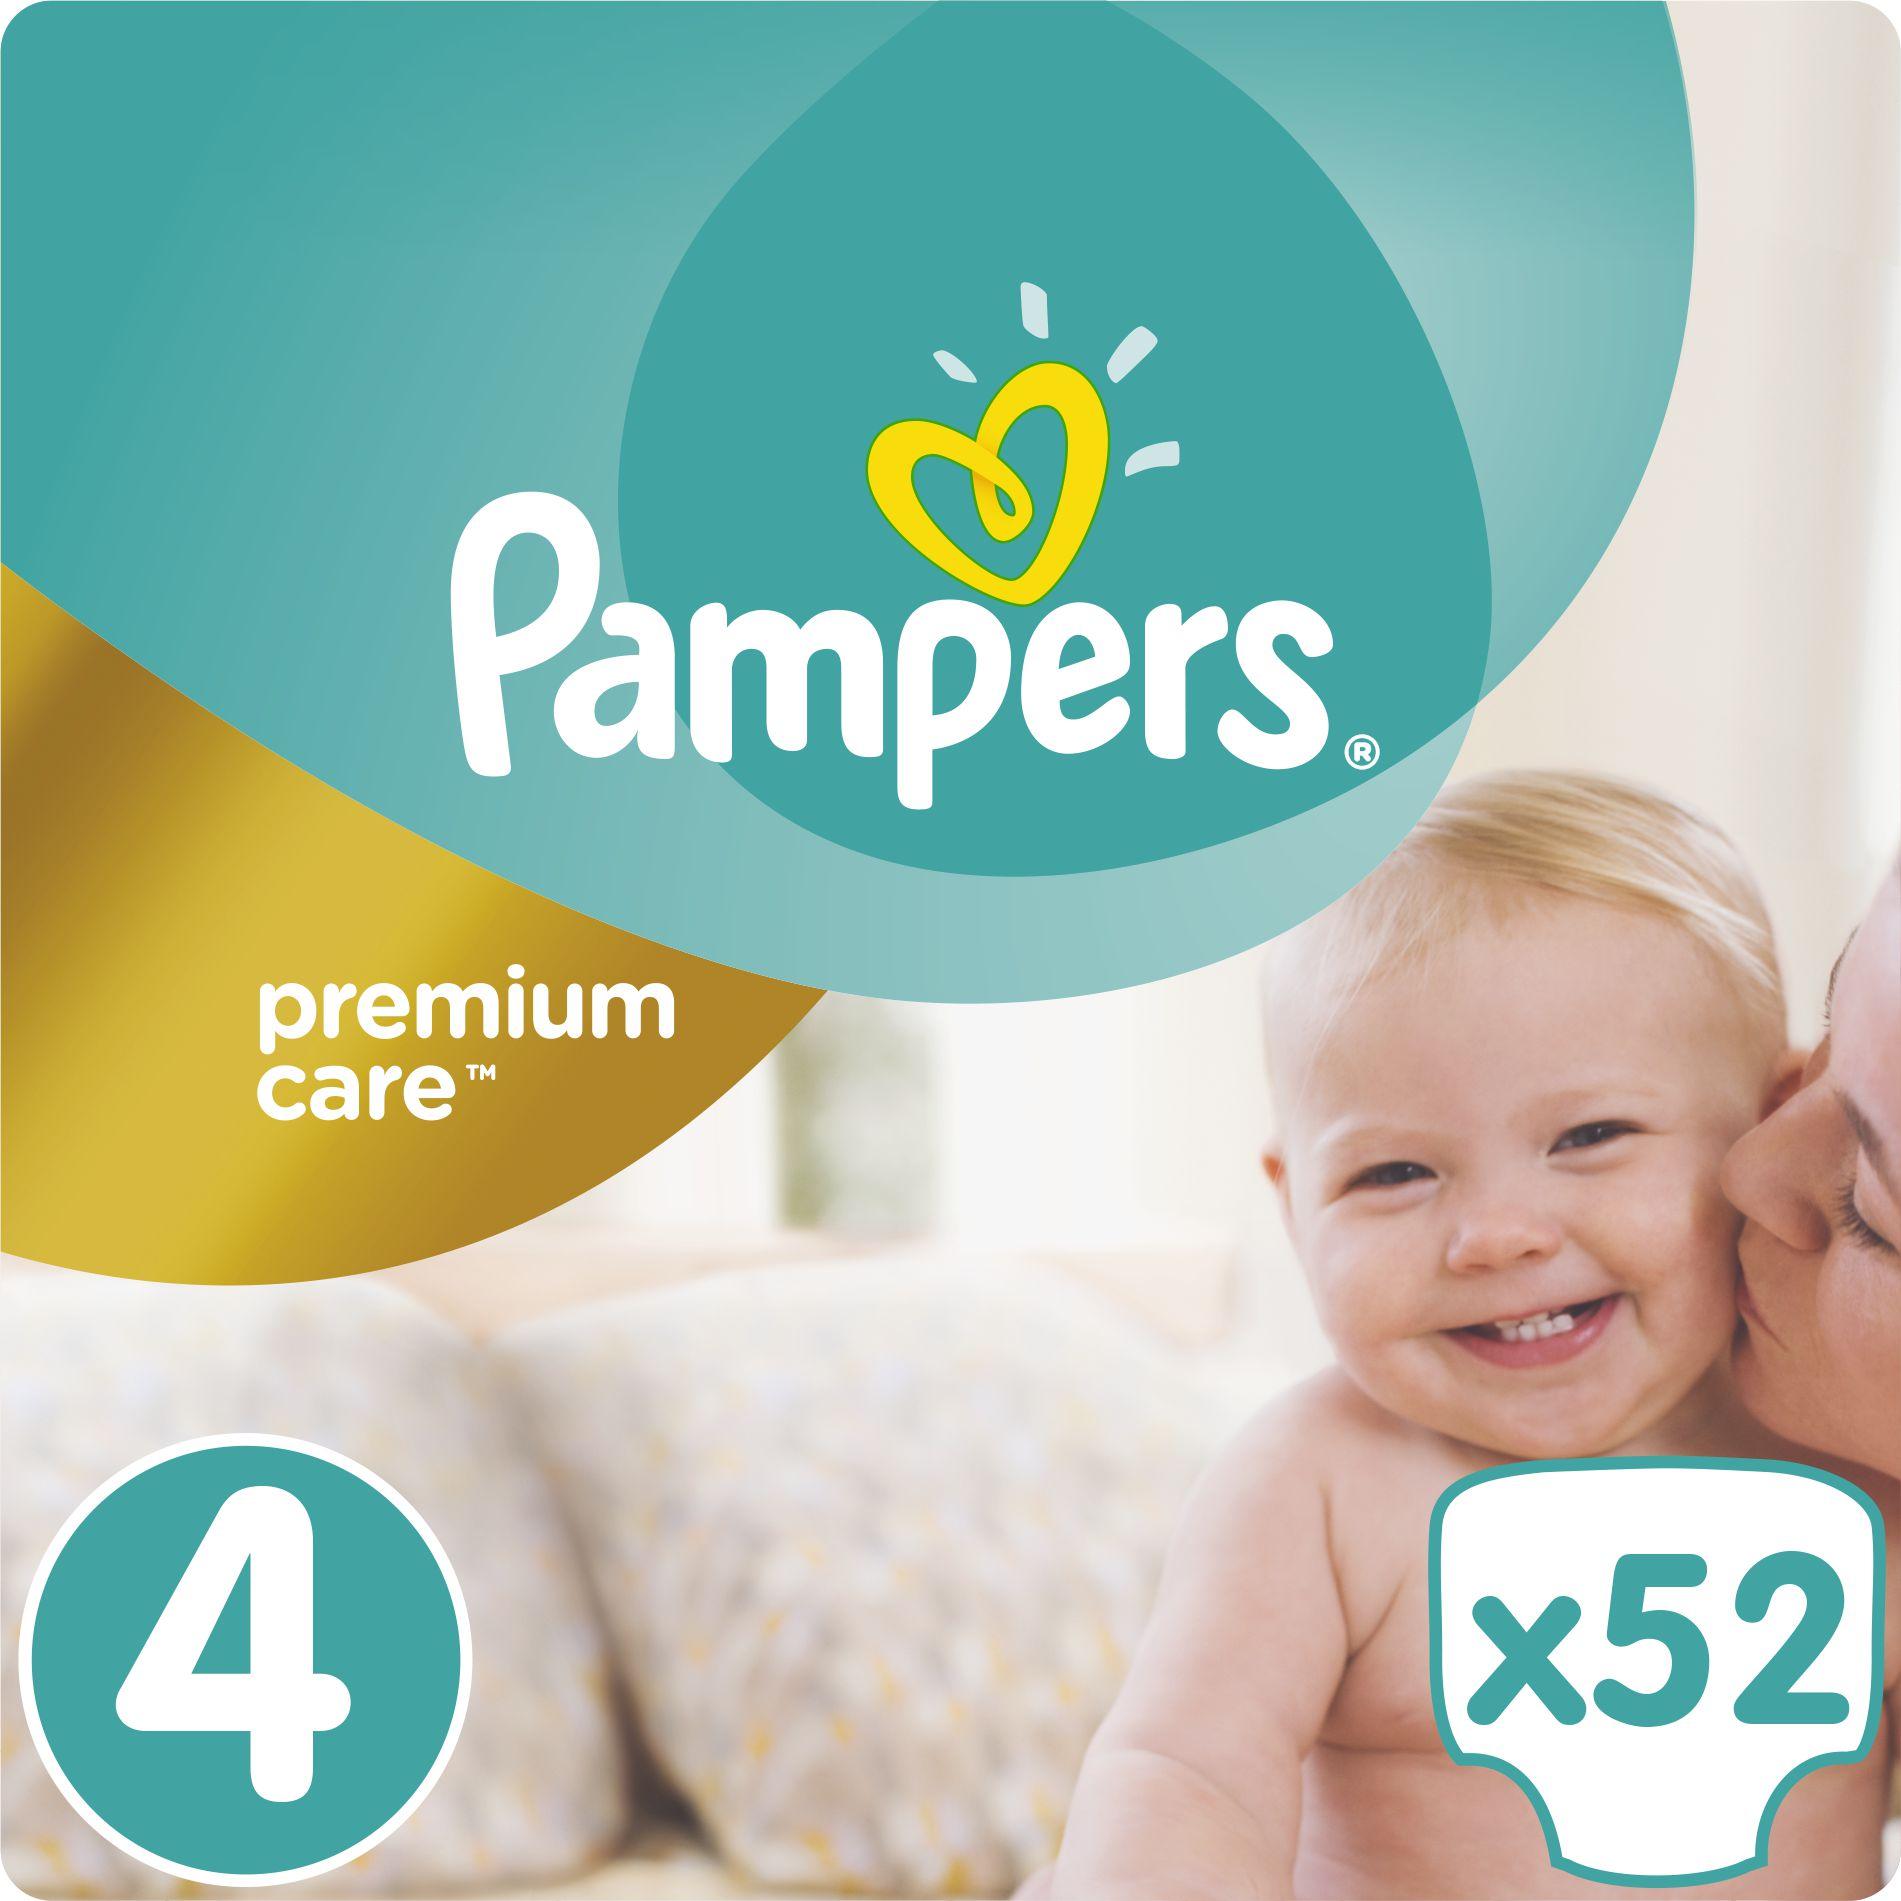 Pampers Premium Care rozmiar 4 (Maxi), 8-14kg, 52 pieluszki 1234754